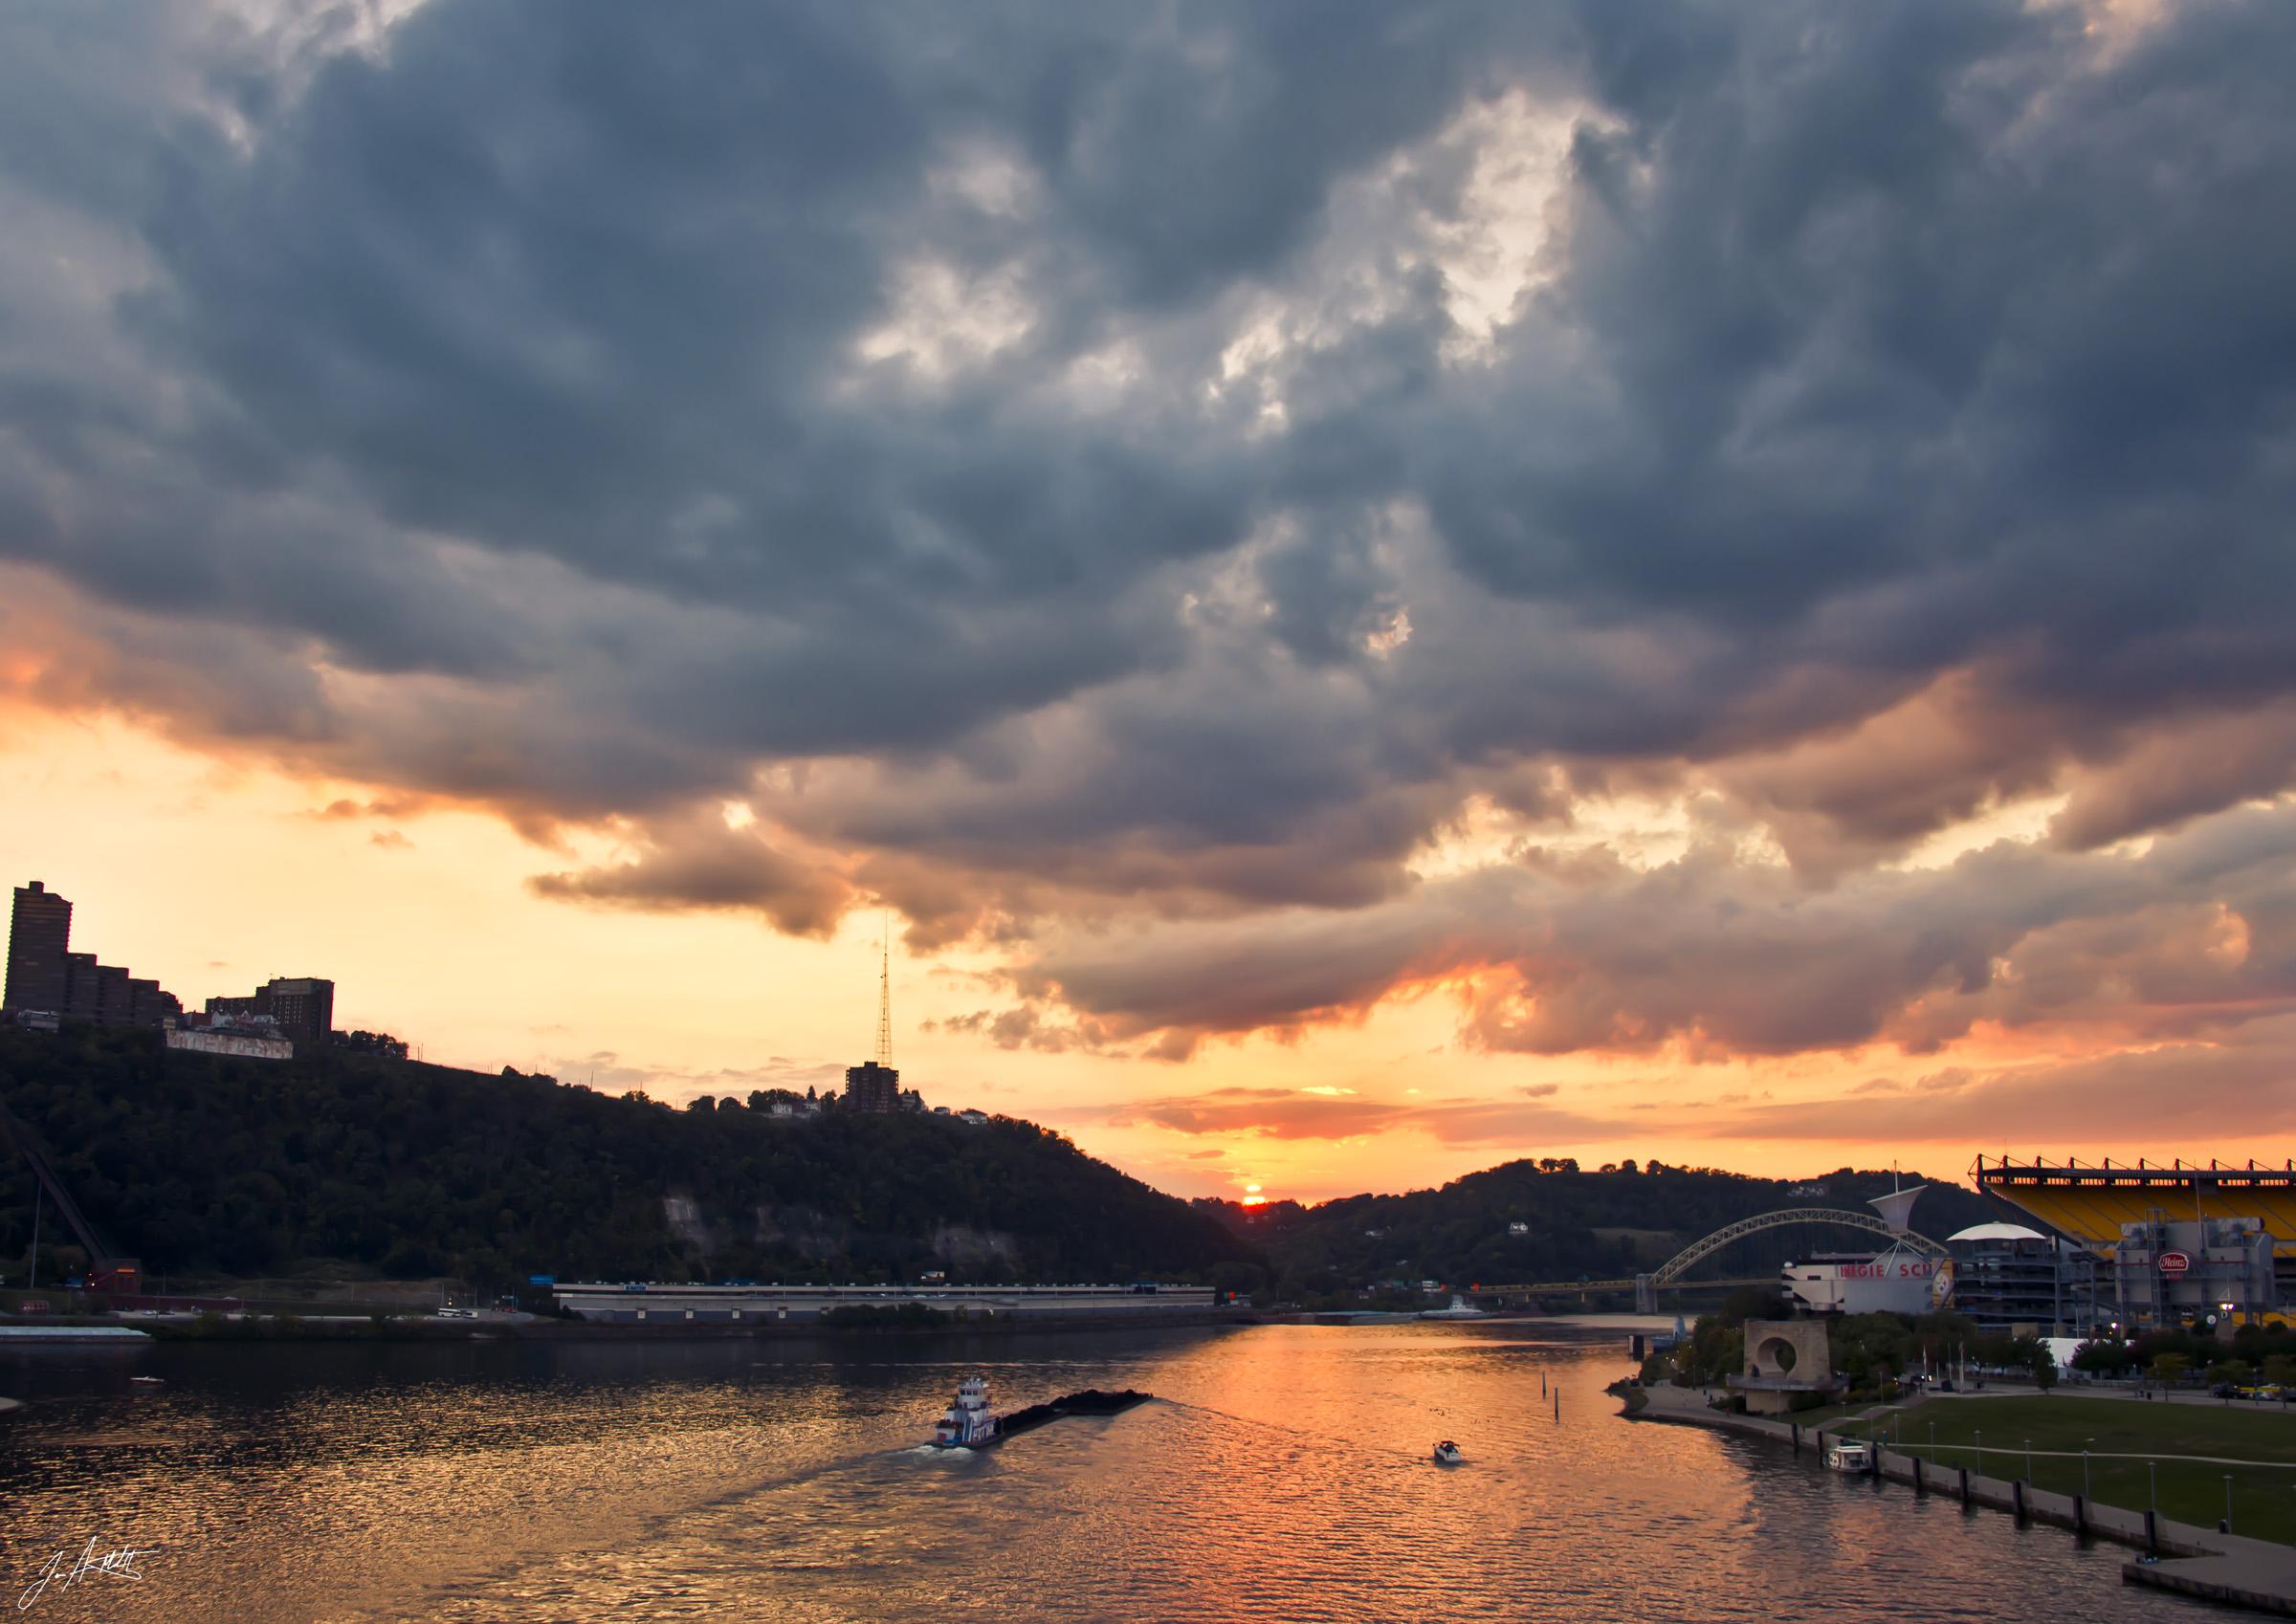 Day272_SunsetDelivery_september29